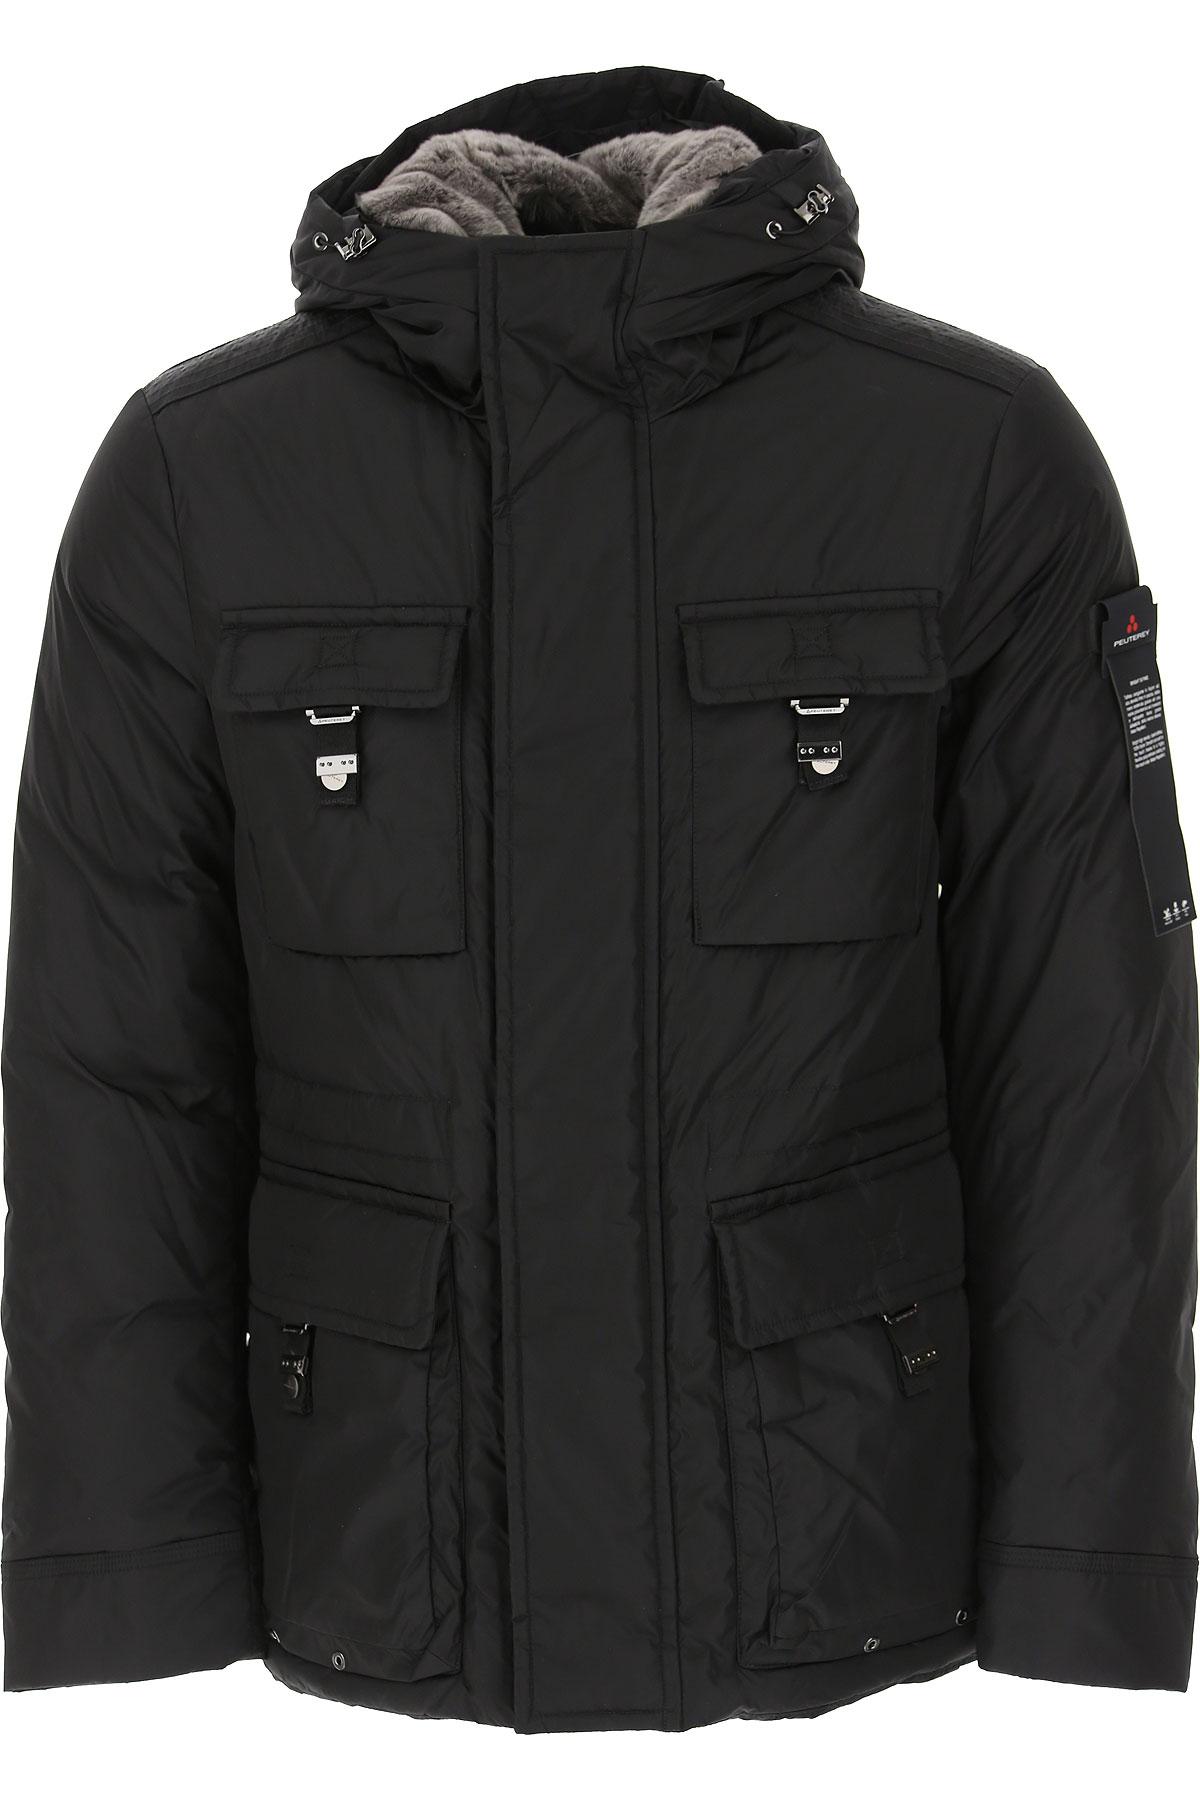 Peuterey Down Jacket for Men, Puffer Ski Jacket On Sale, Black, polyamide, 2019, L M S XL XXL